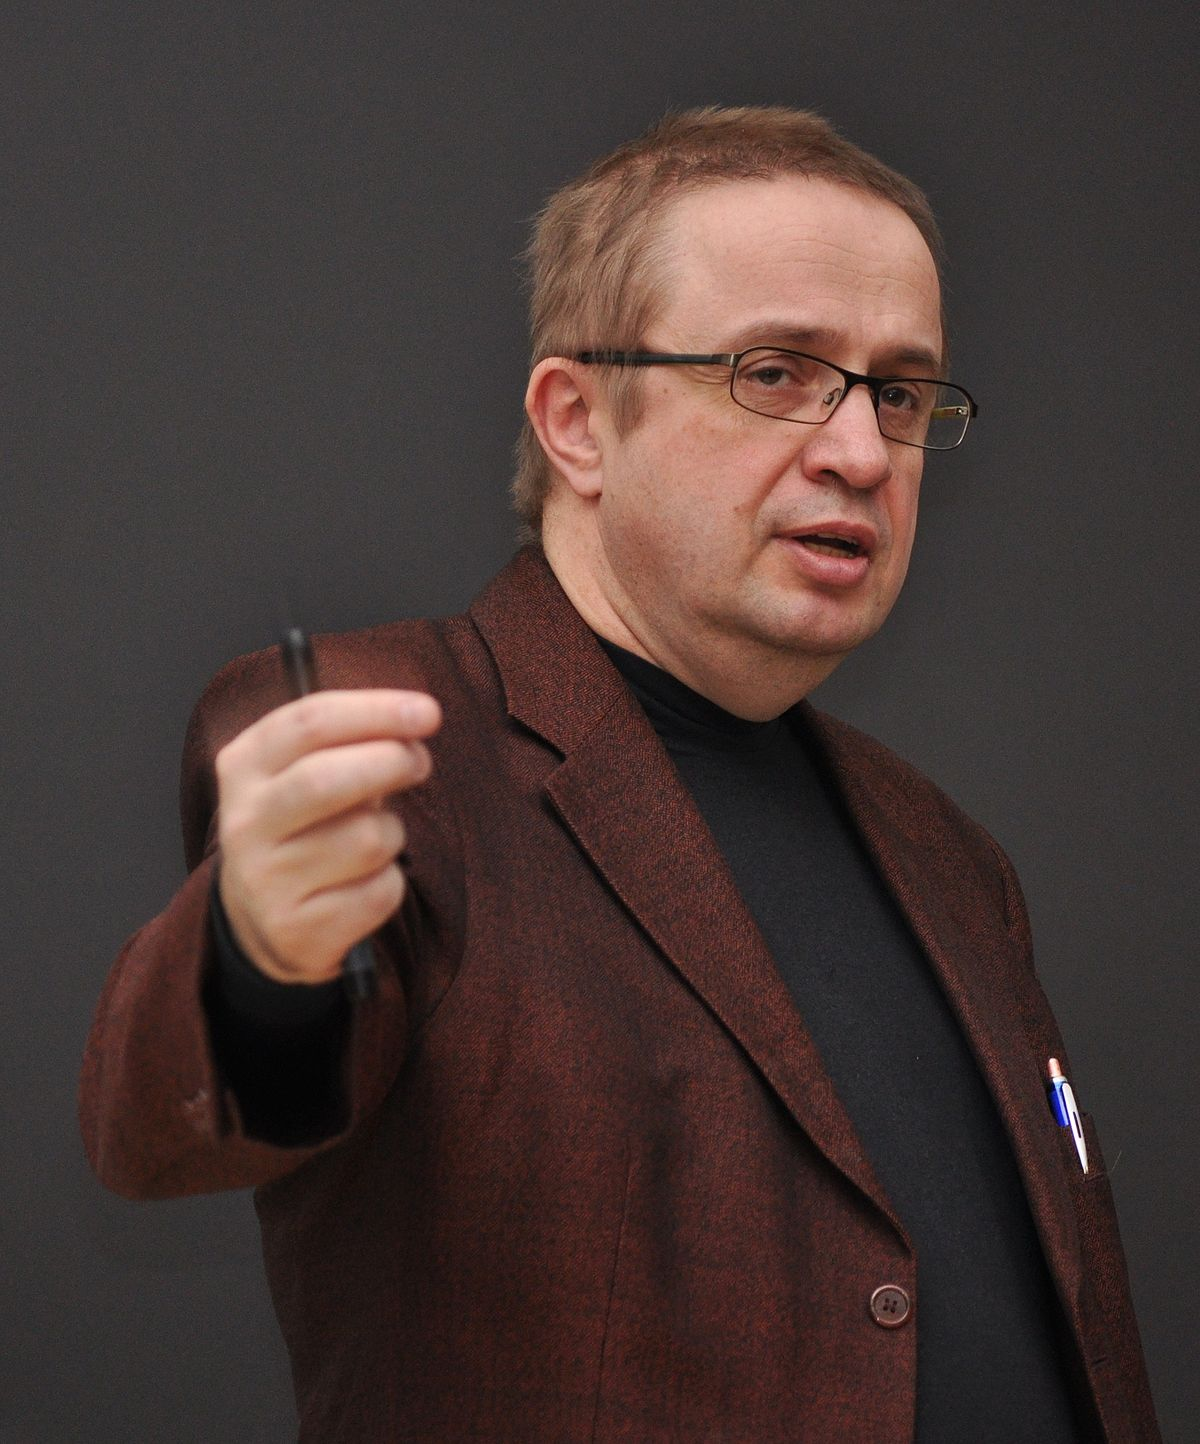 Markku Tapio Rovaniemi